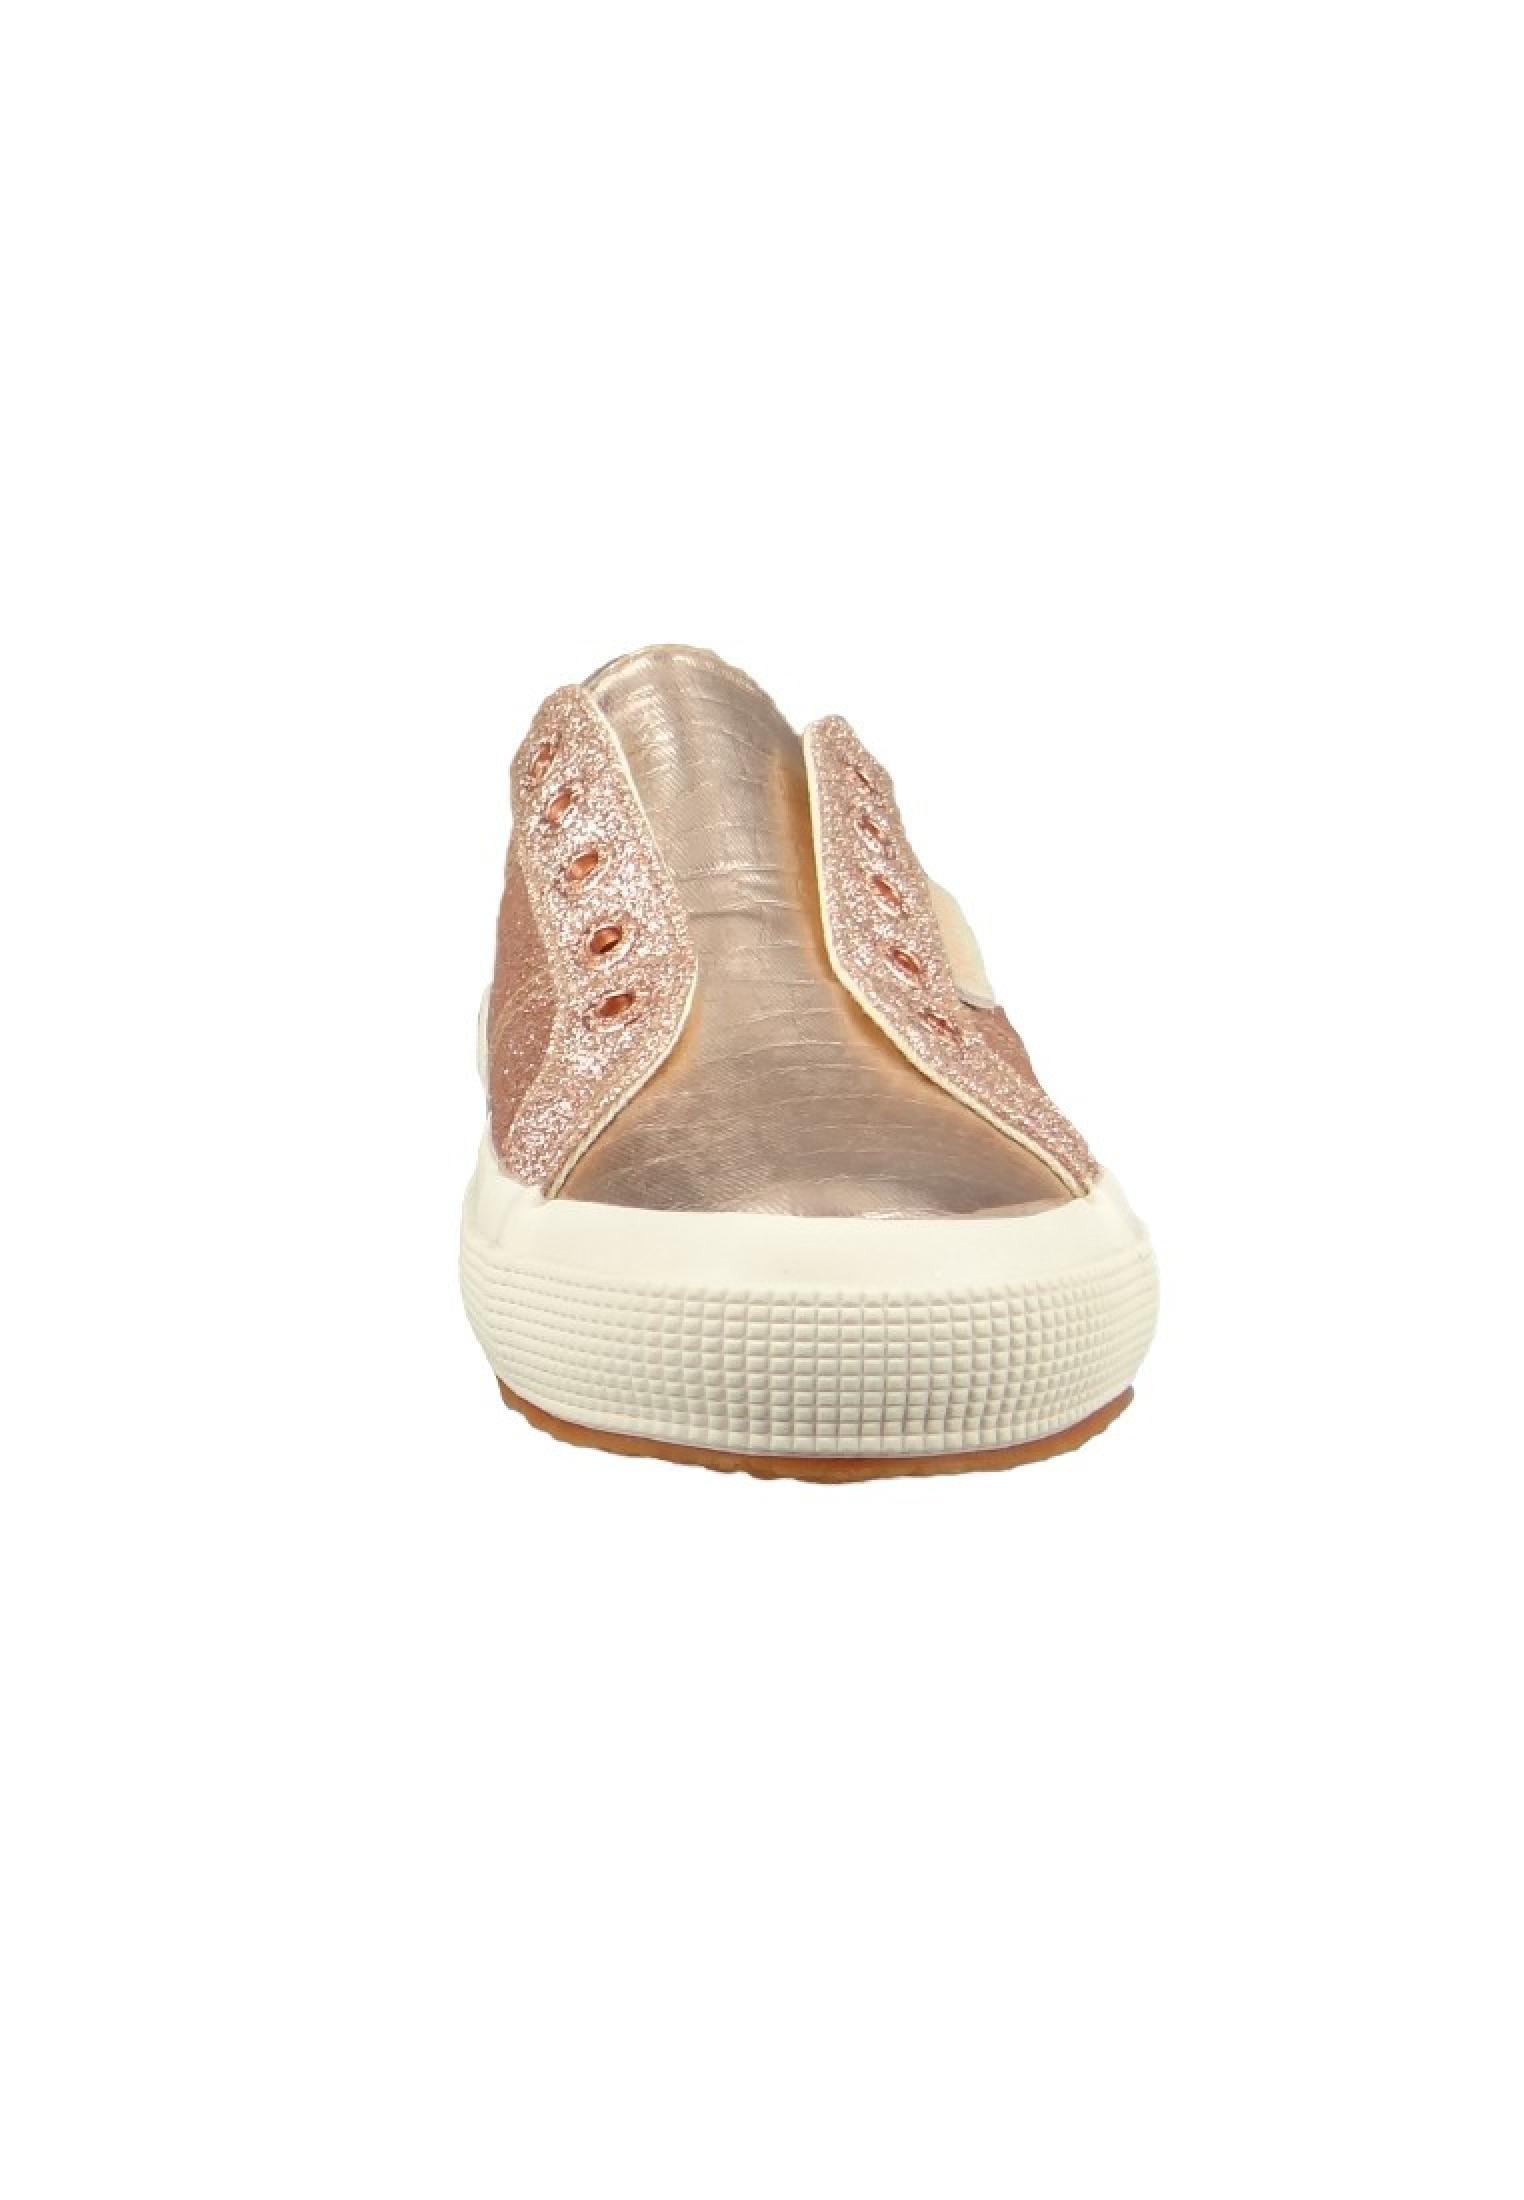 superga schuhe sneaker 2750 s00bf50 916 microglittercotmetcoccow rose gold damenschuhe sneaker. Black Bedroom Furniture Sets. Home Design Ideas